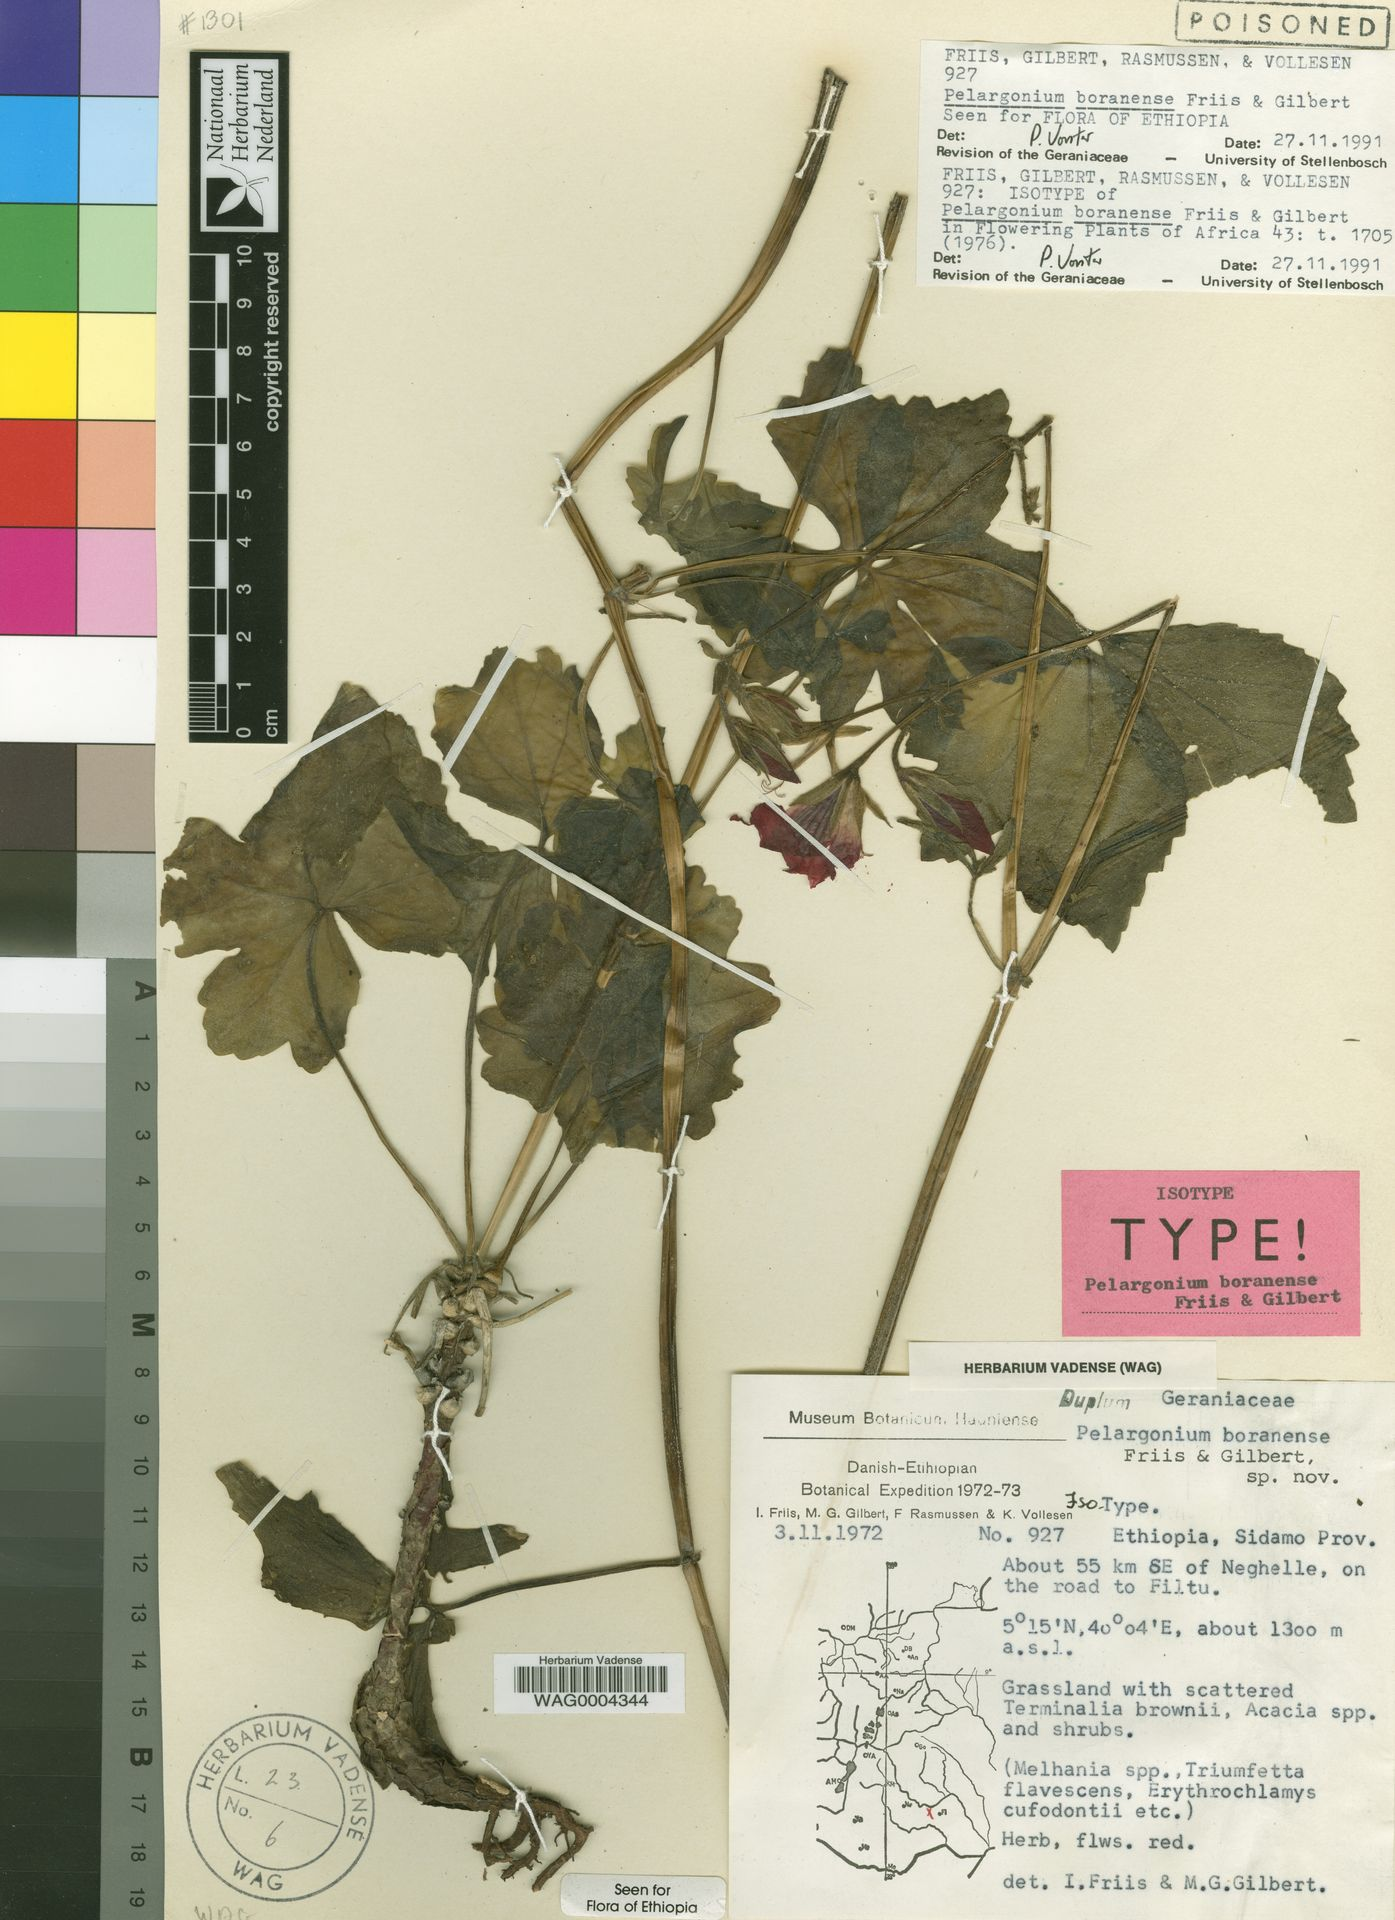 WAG.1813550 | Pelargonium boranense Friis & M.G.Gilbert